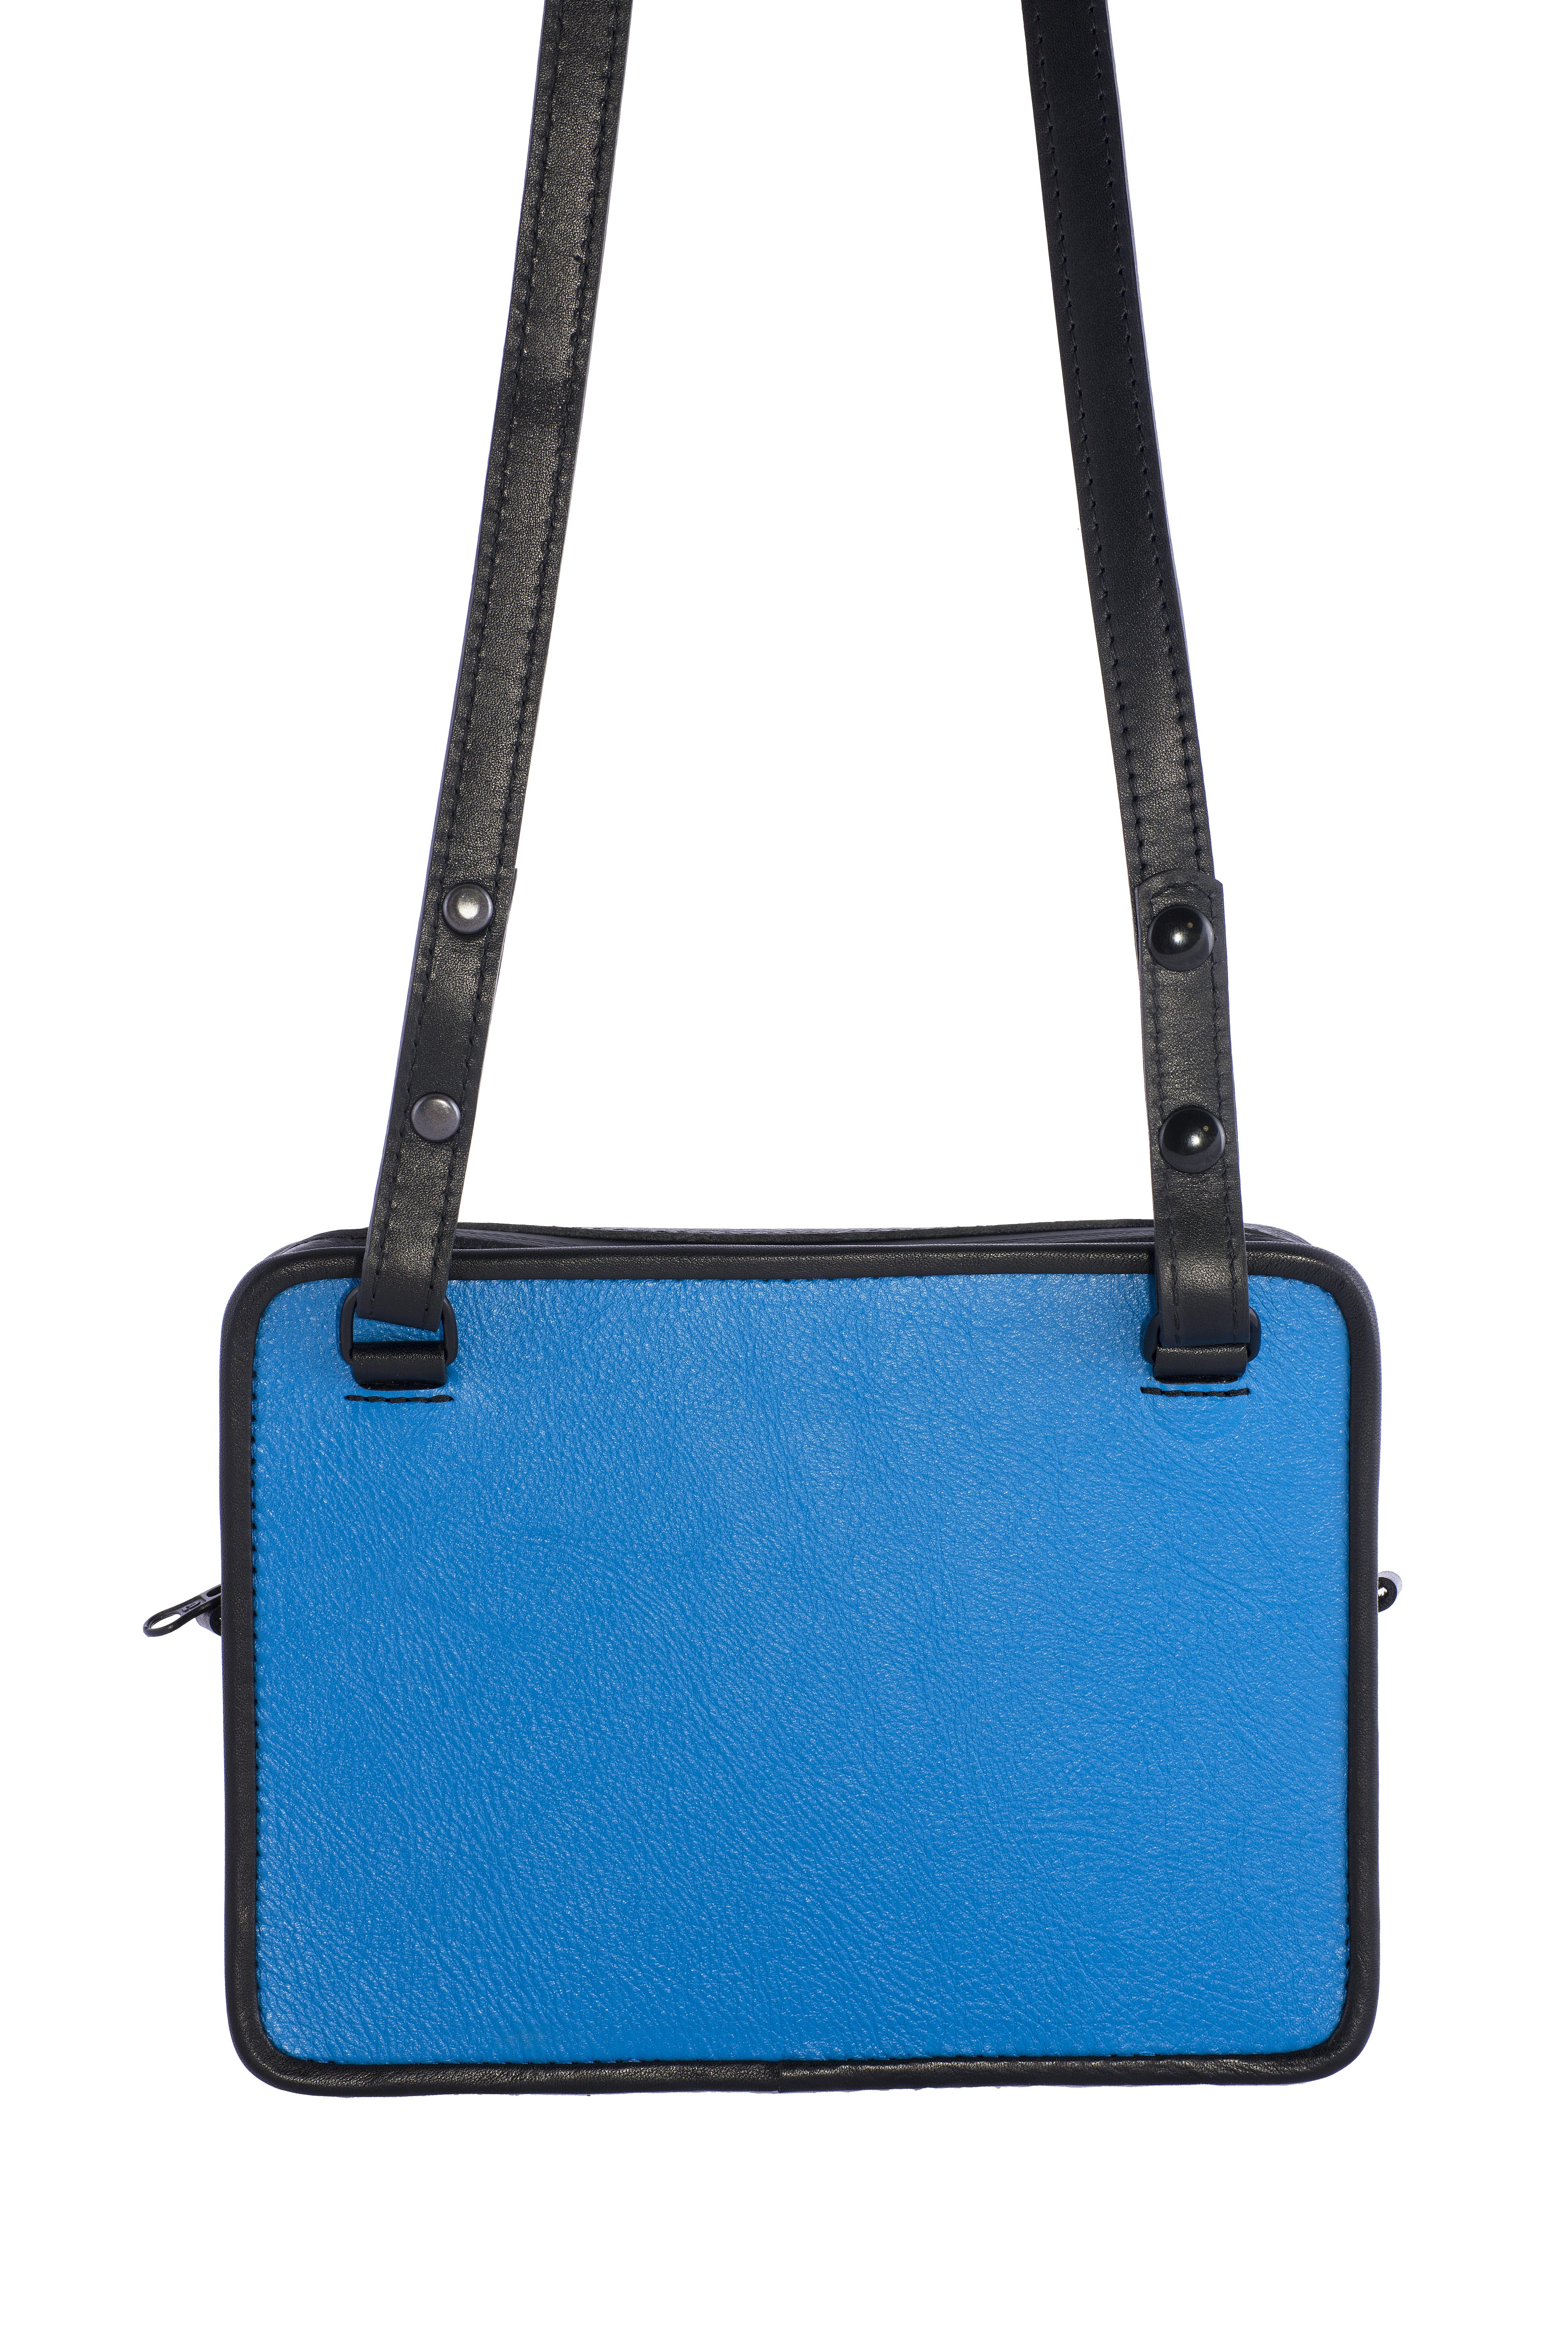 c5e9f501b24 Shoulder bag by Tiina Andron – Eesti Disaini Maja / Estonian Design ...